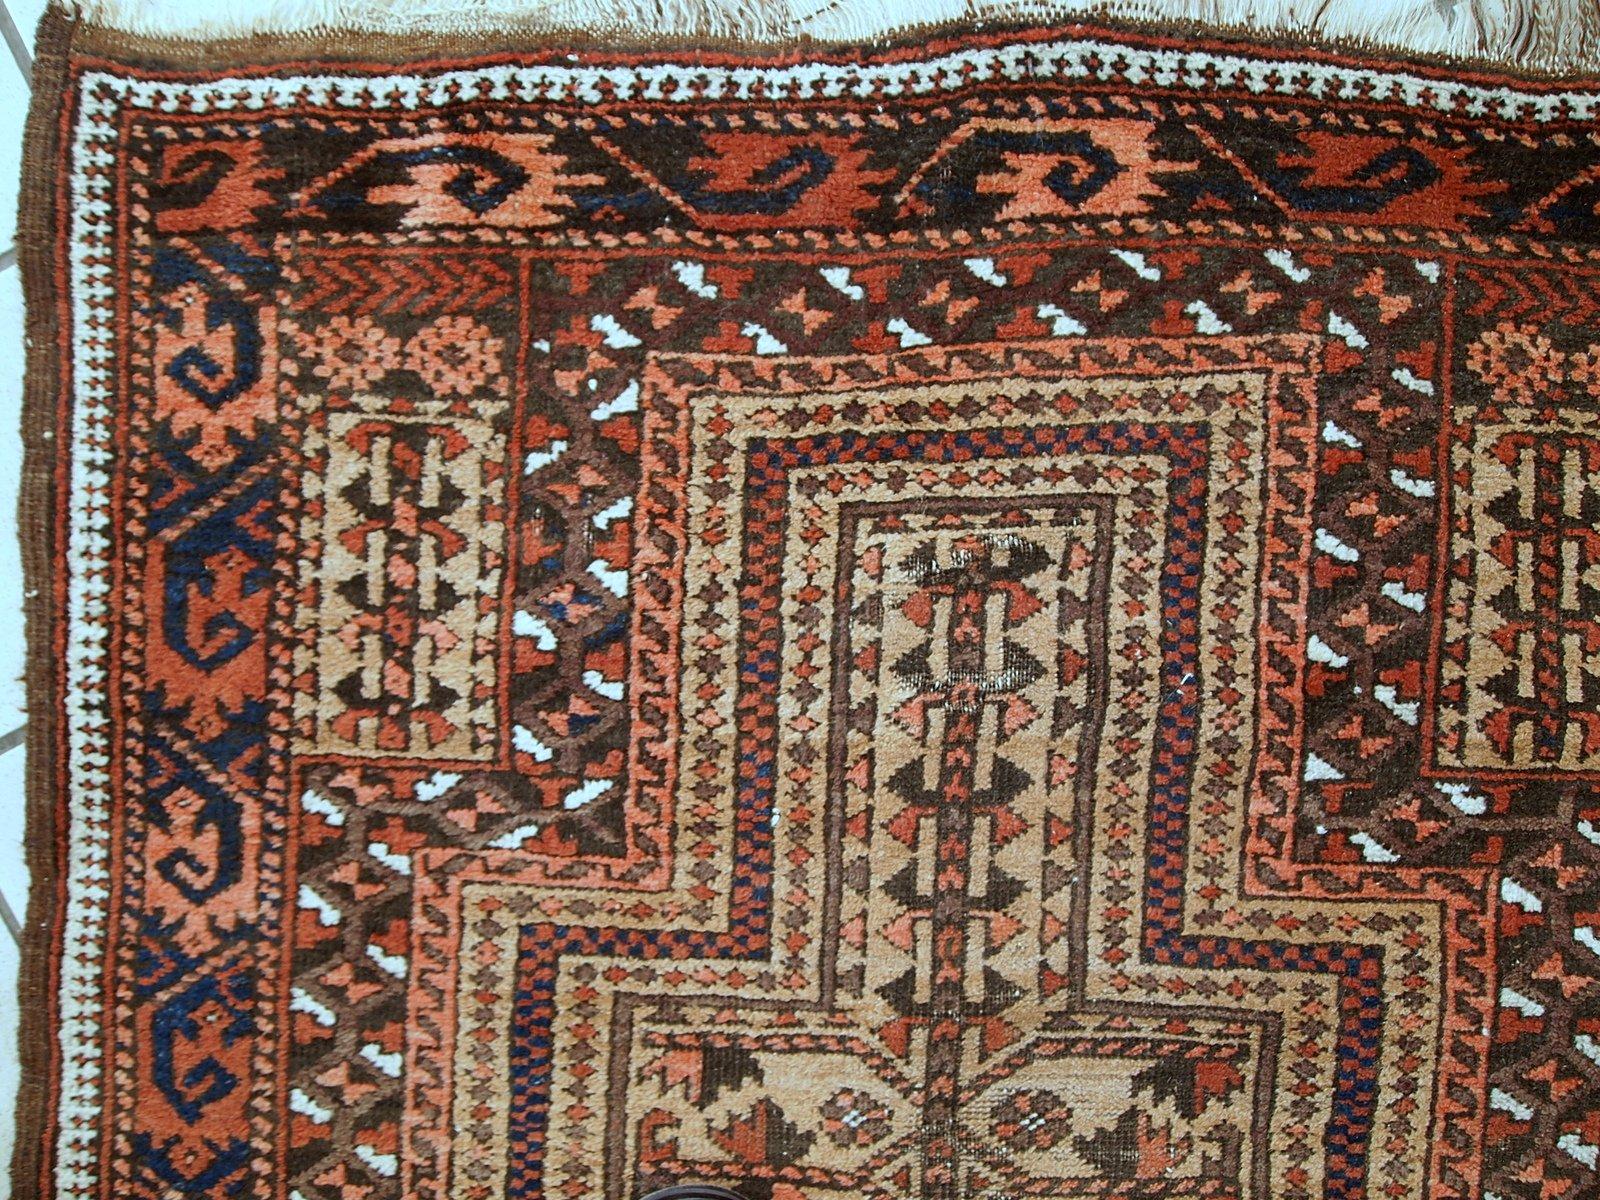 Antique Handmade Afghan Baluch Prayer Rug 1900s